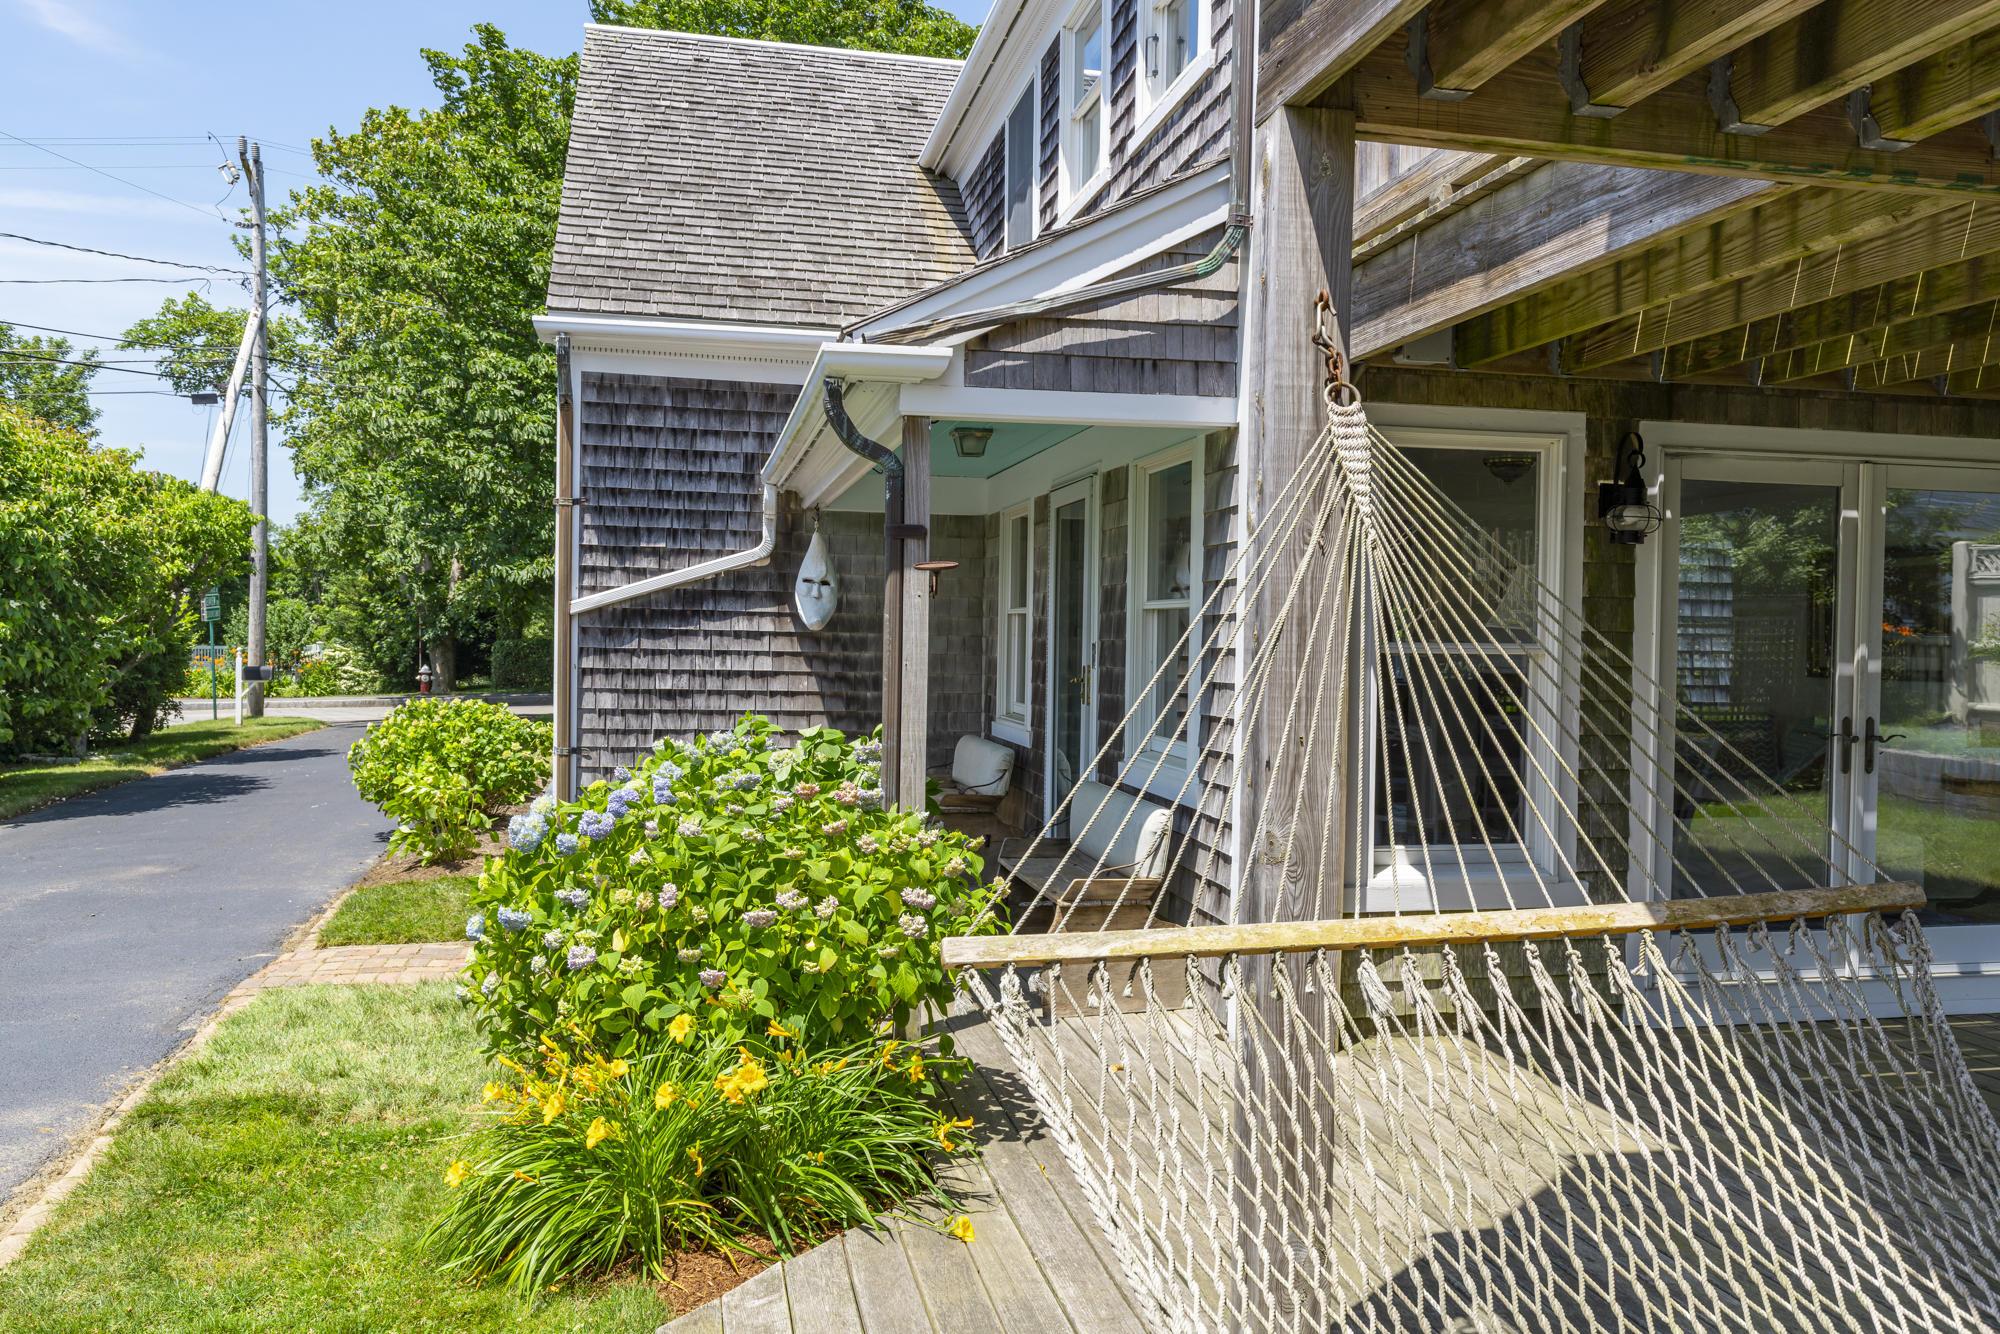 90 Seaview Street, Chatham, MA  02633 - slide 41